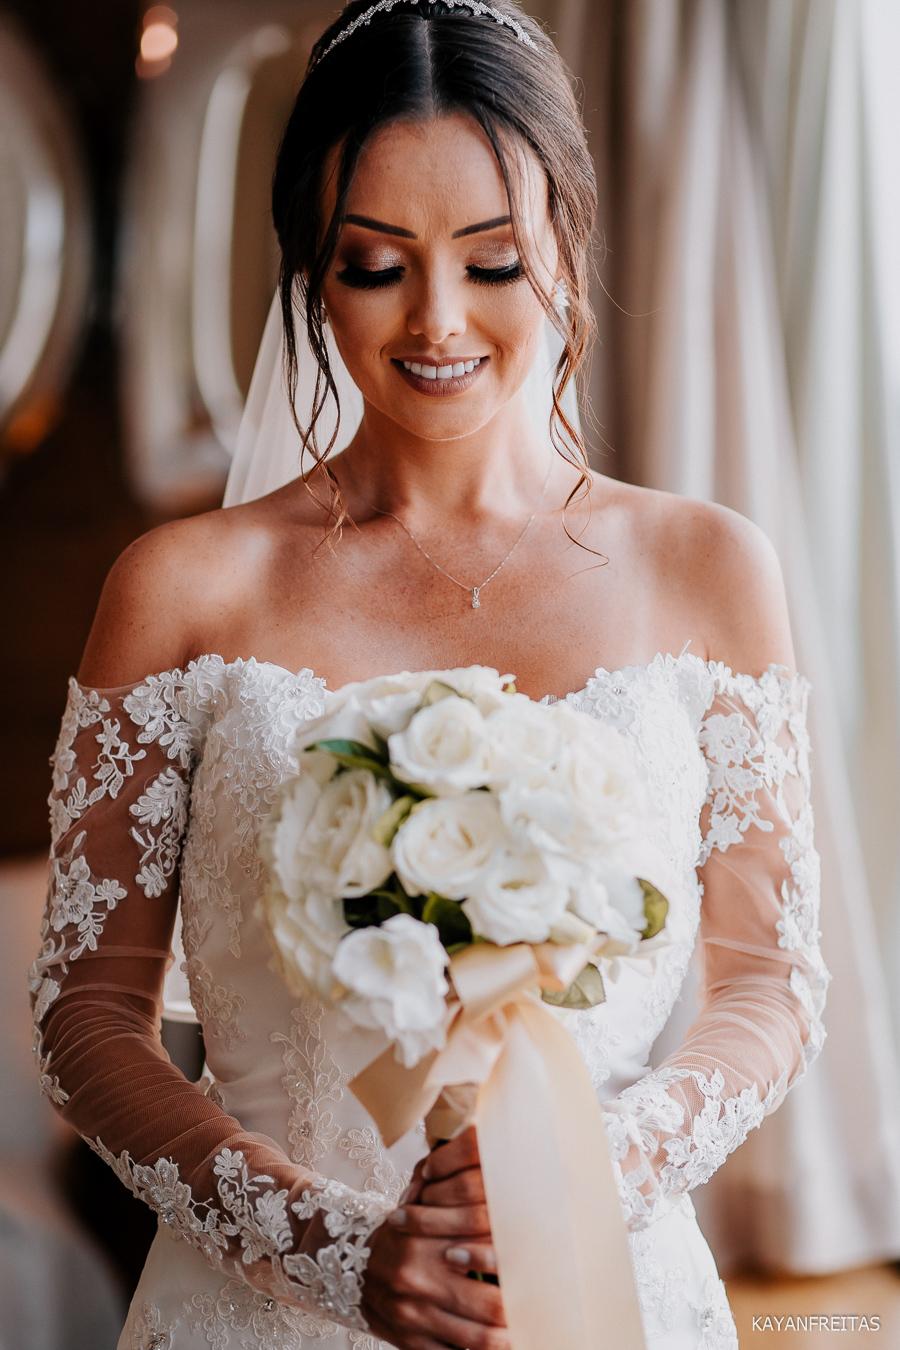 casamento-indaia-floripa-0030 Casamento Indaiá Florianópolis - Deise e Dário